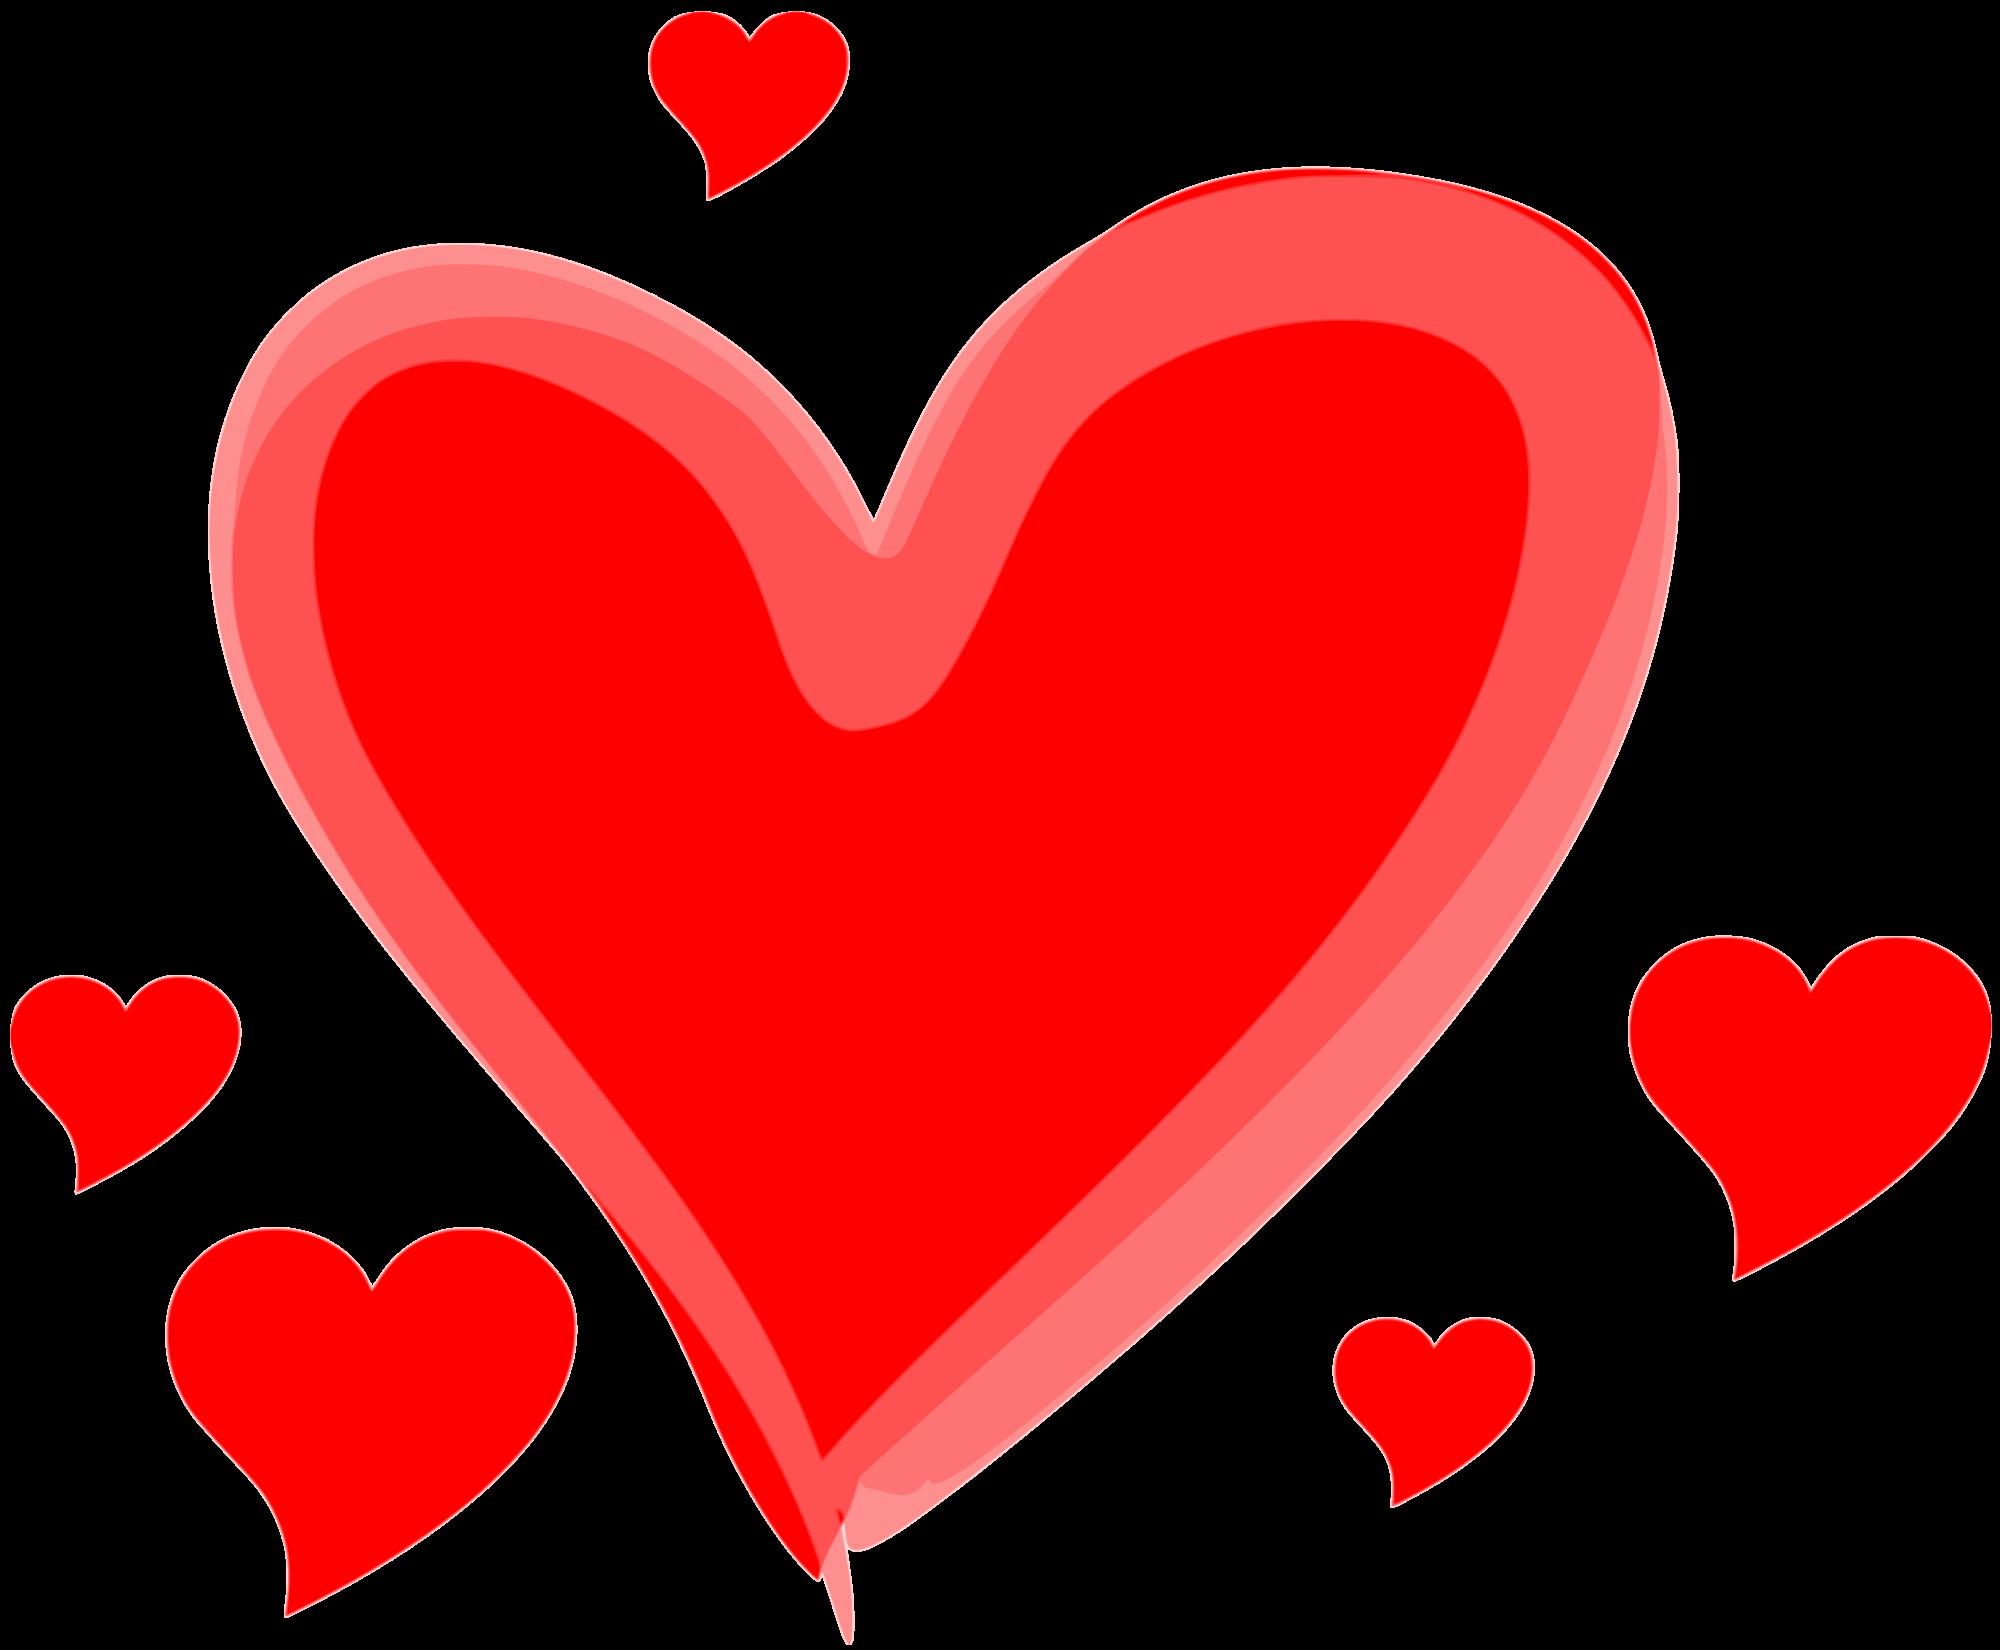 Free Cartoon Love Heart, Download Free Clip Art, Free Clip Art on.